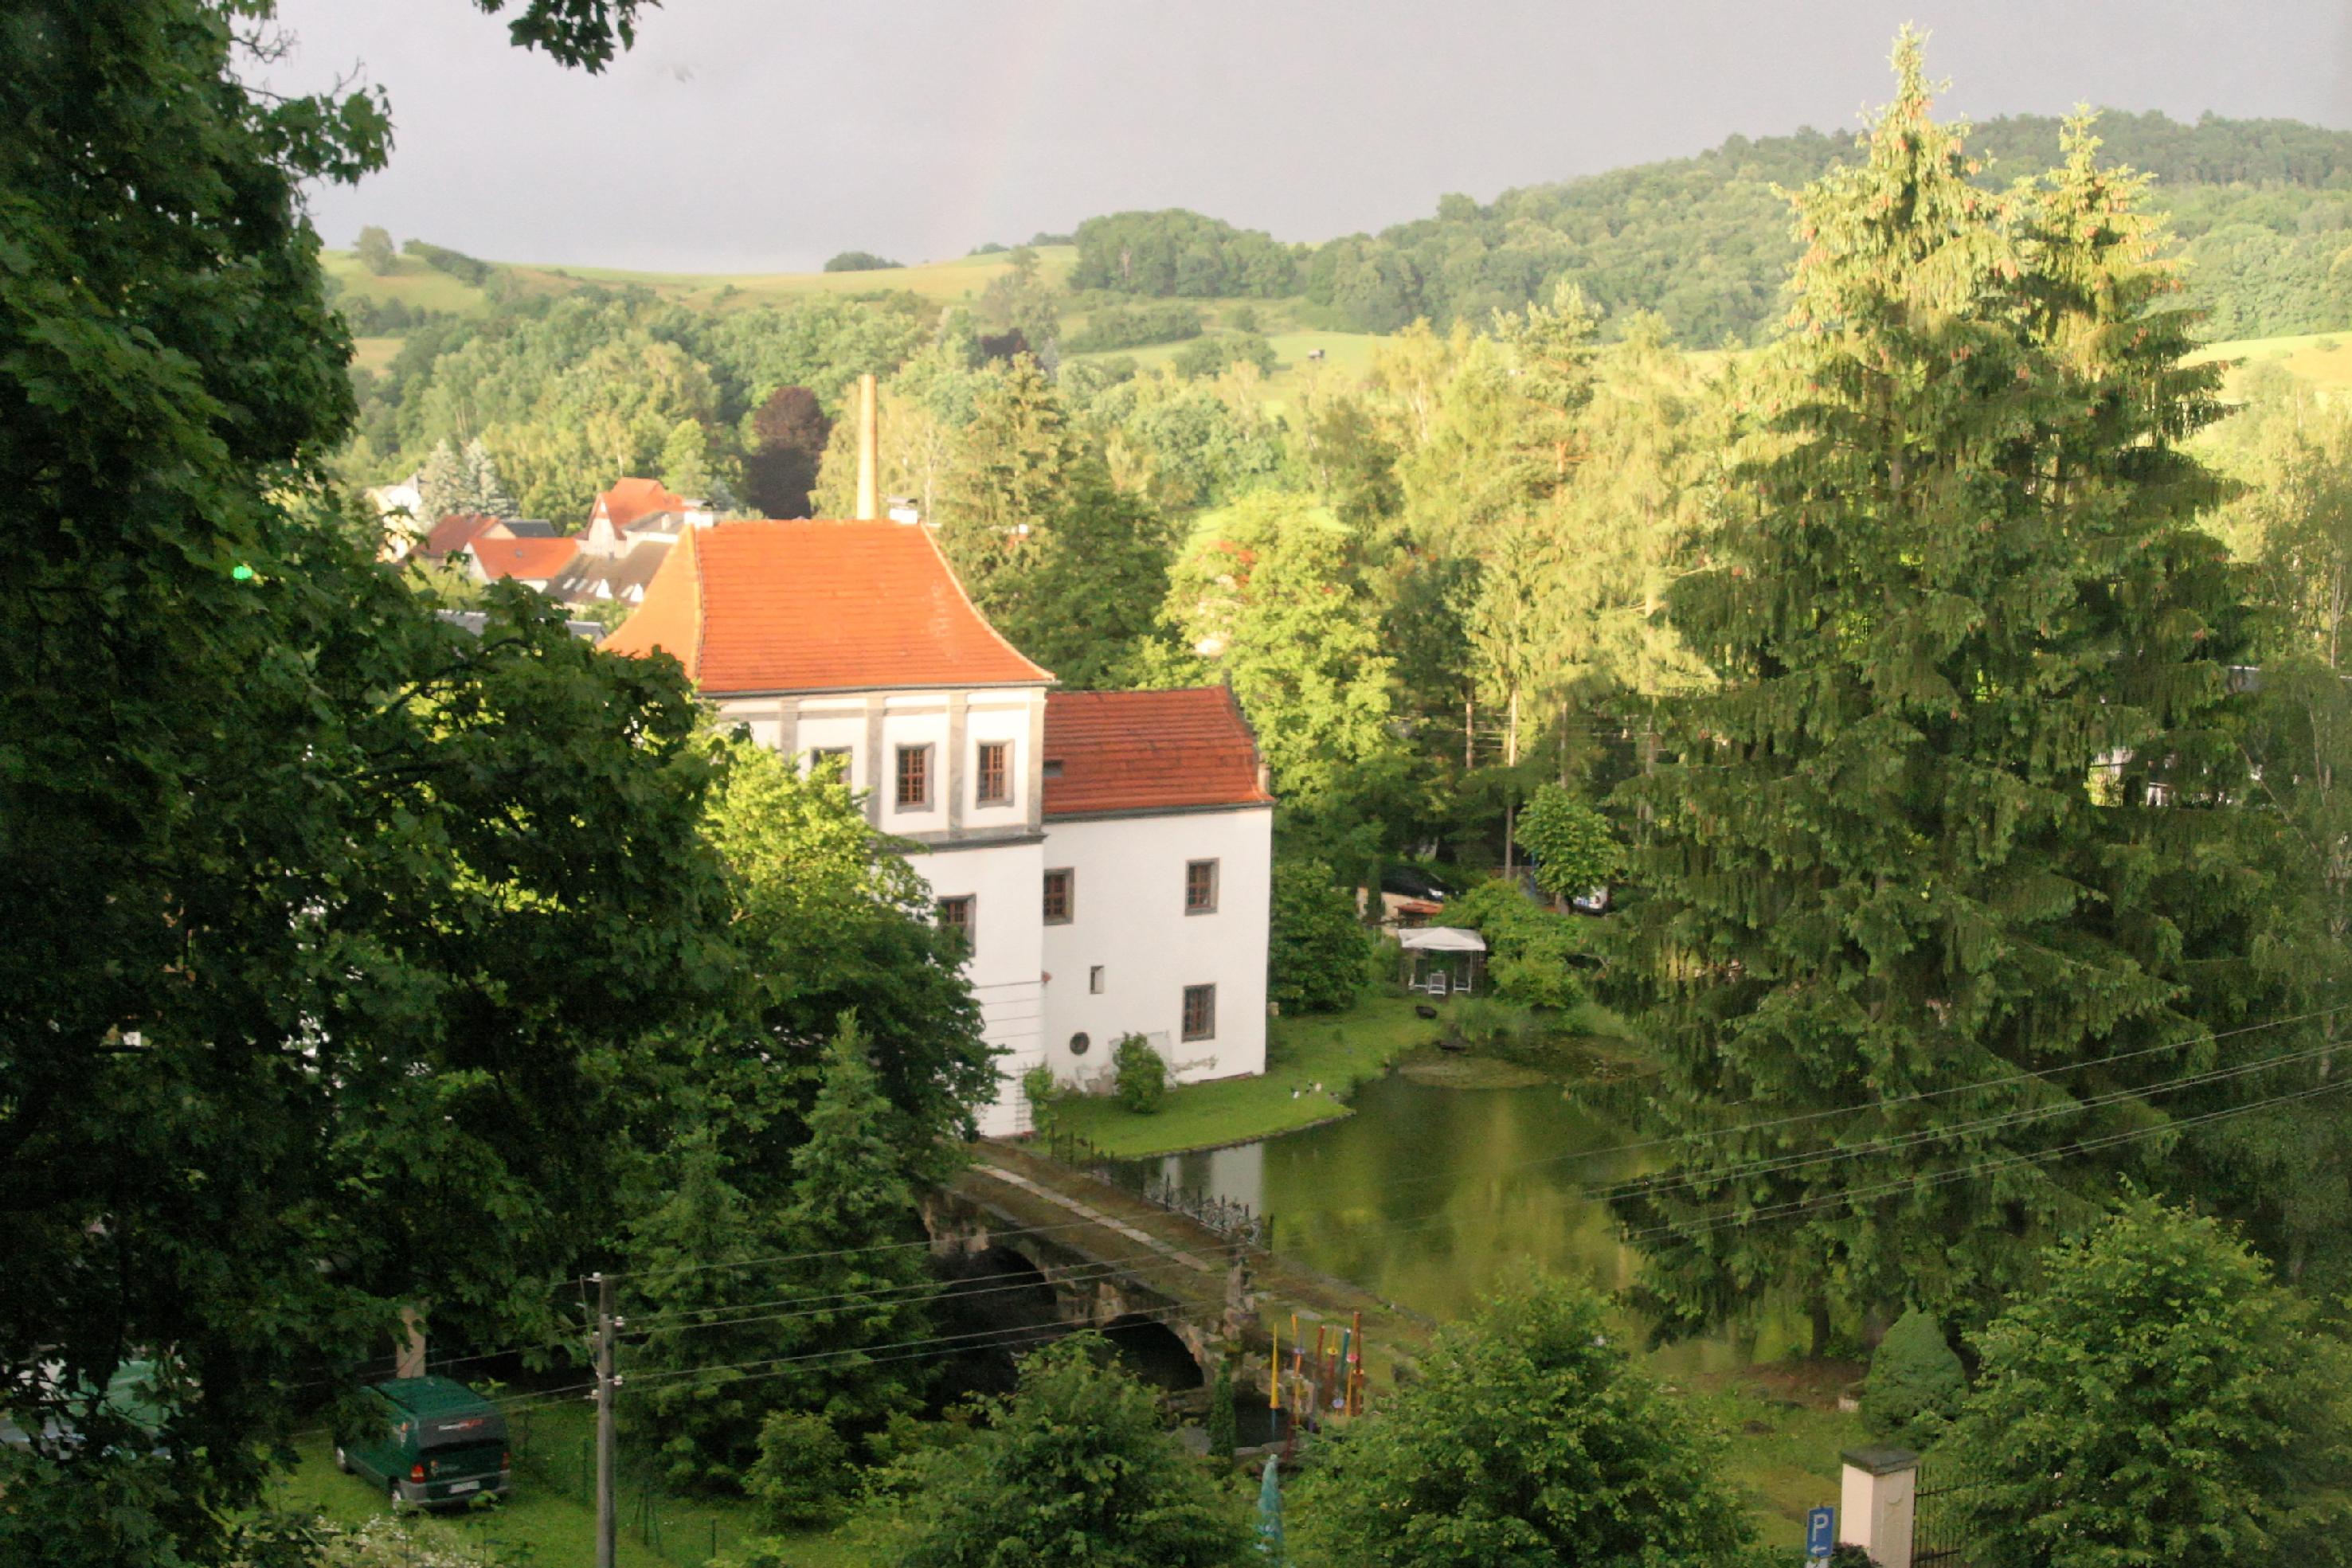 IMG_9097Schlossfest-Hainewalde-2016